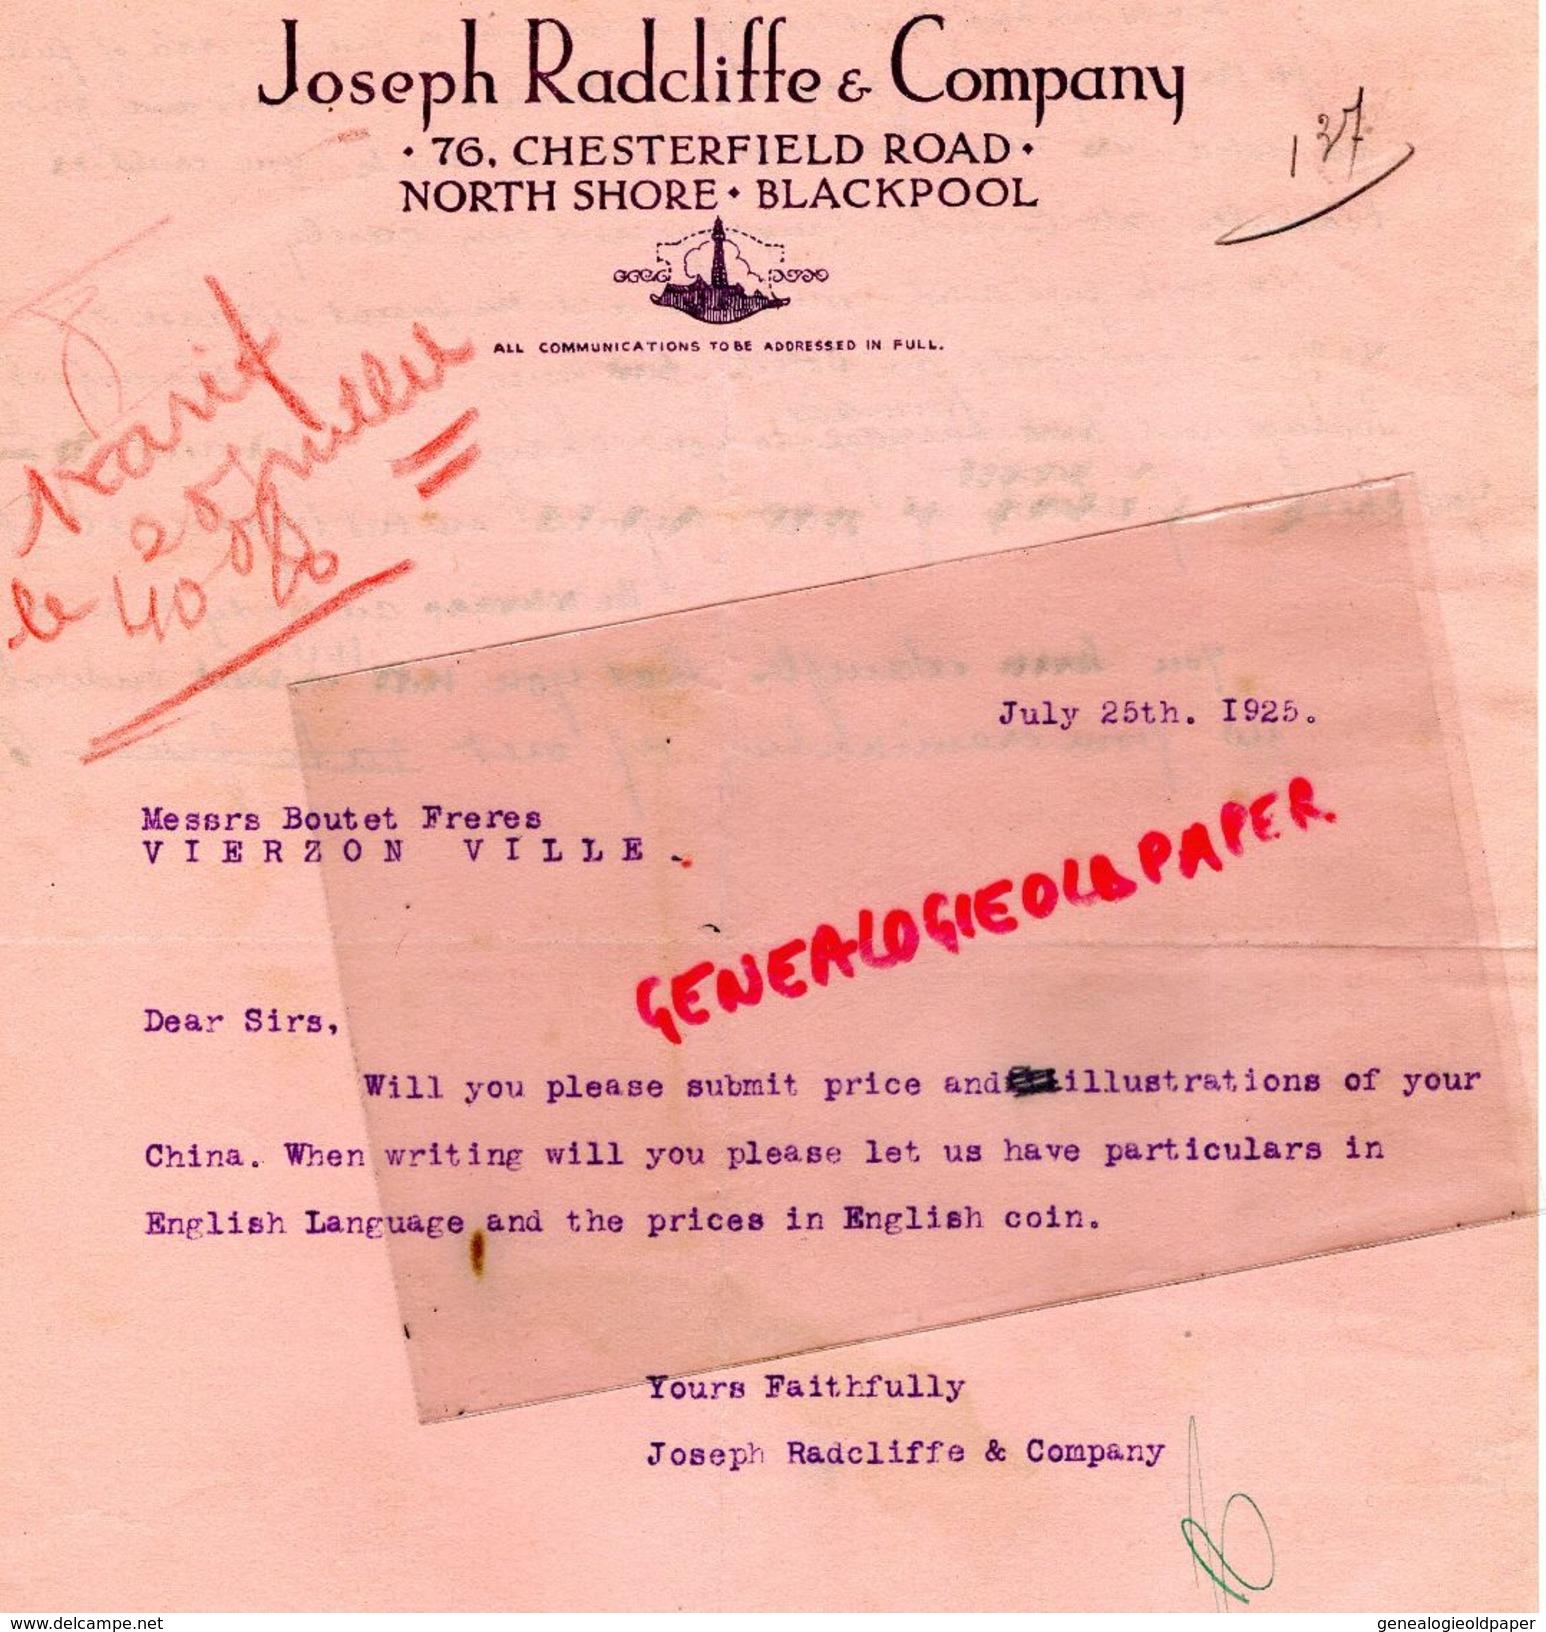 ROYAUME UNI -ANGLETERRE-LETTRE JOSEPH RADCLIFFE COMPANY-76 CHESTERFIELD ROAD-NORTH SHORE -BLACKPOOL- 1925 BOUTET VIERZON - Royaume-Uni